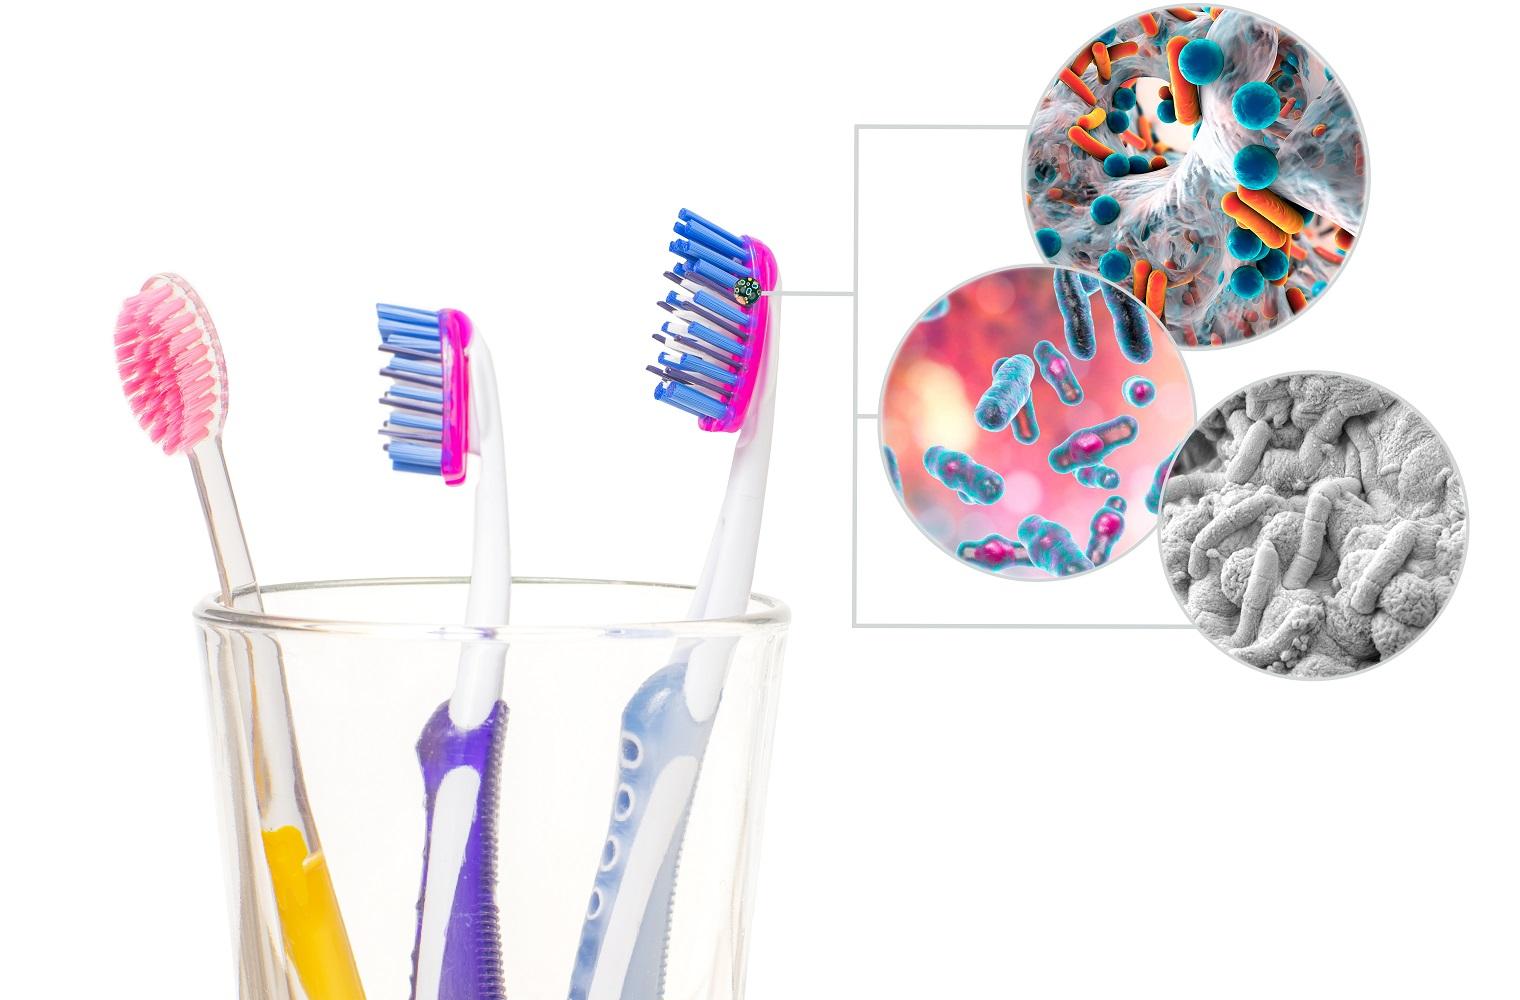 Toothbrush storage-dental hygiene-toothbrush safety